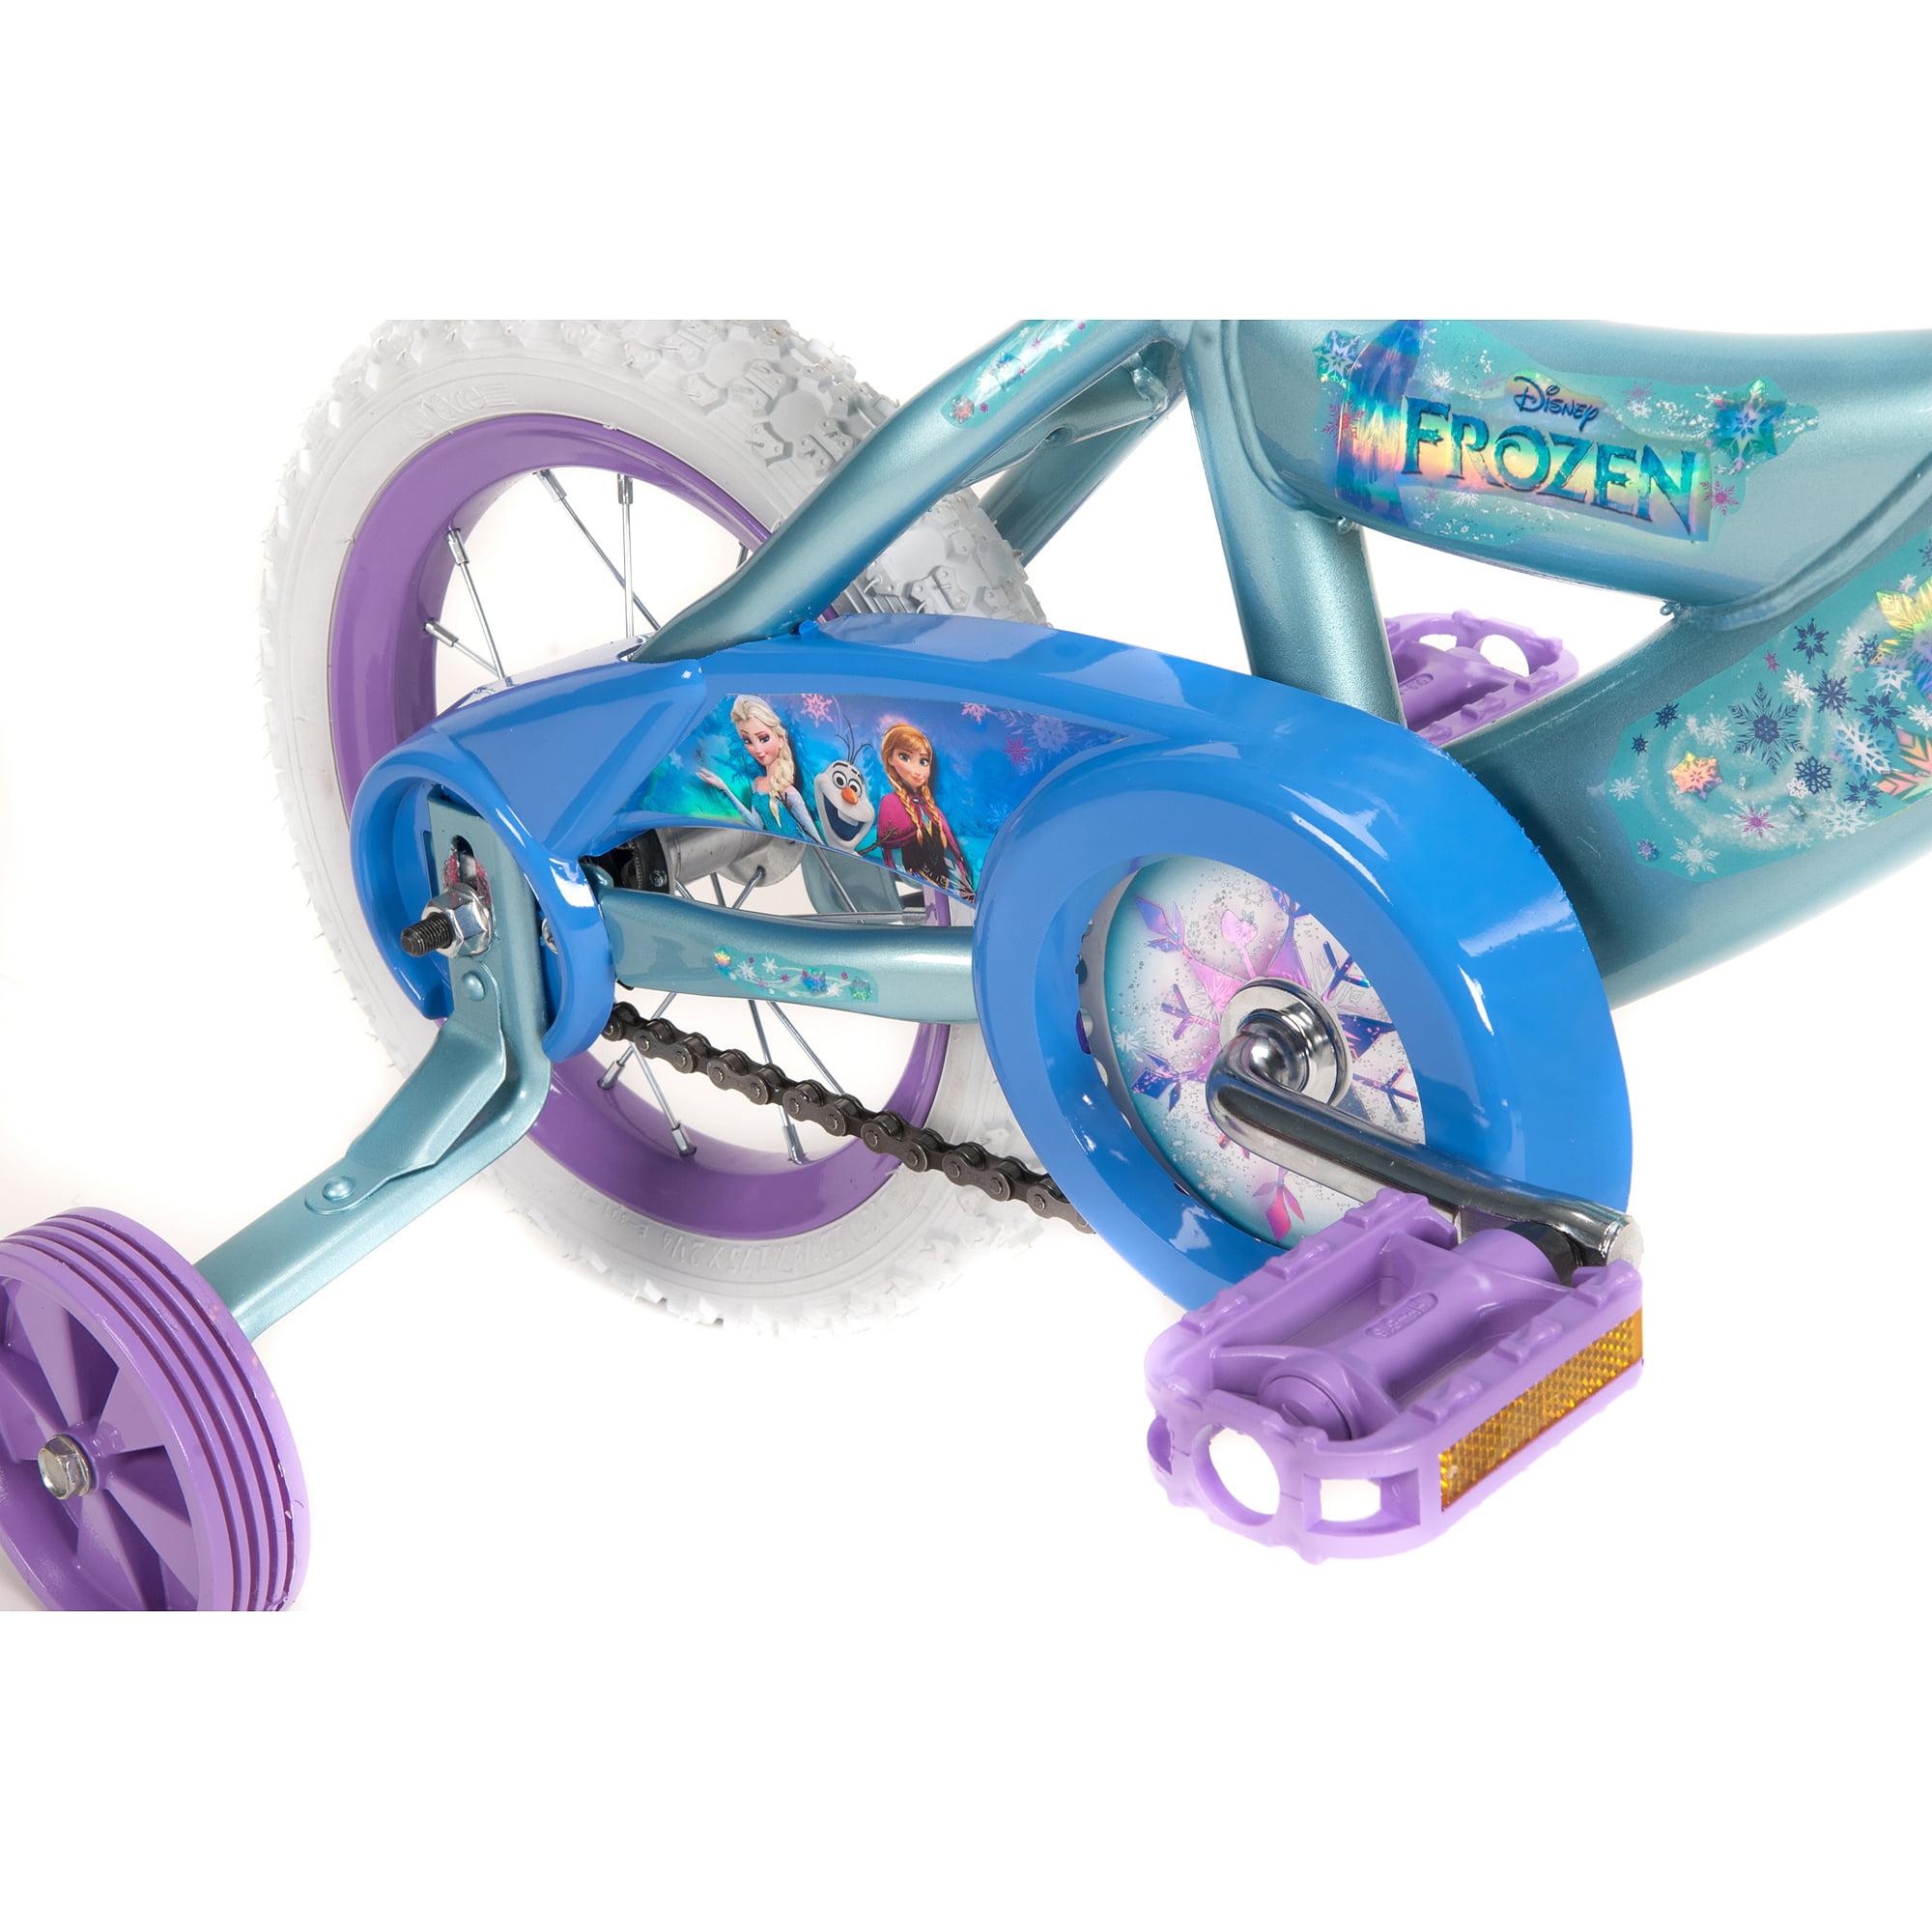 Frozen roller skates walmart - Frozen Roller Skates Walmart 28